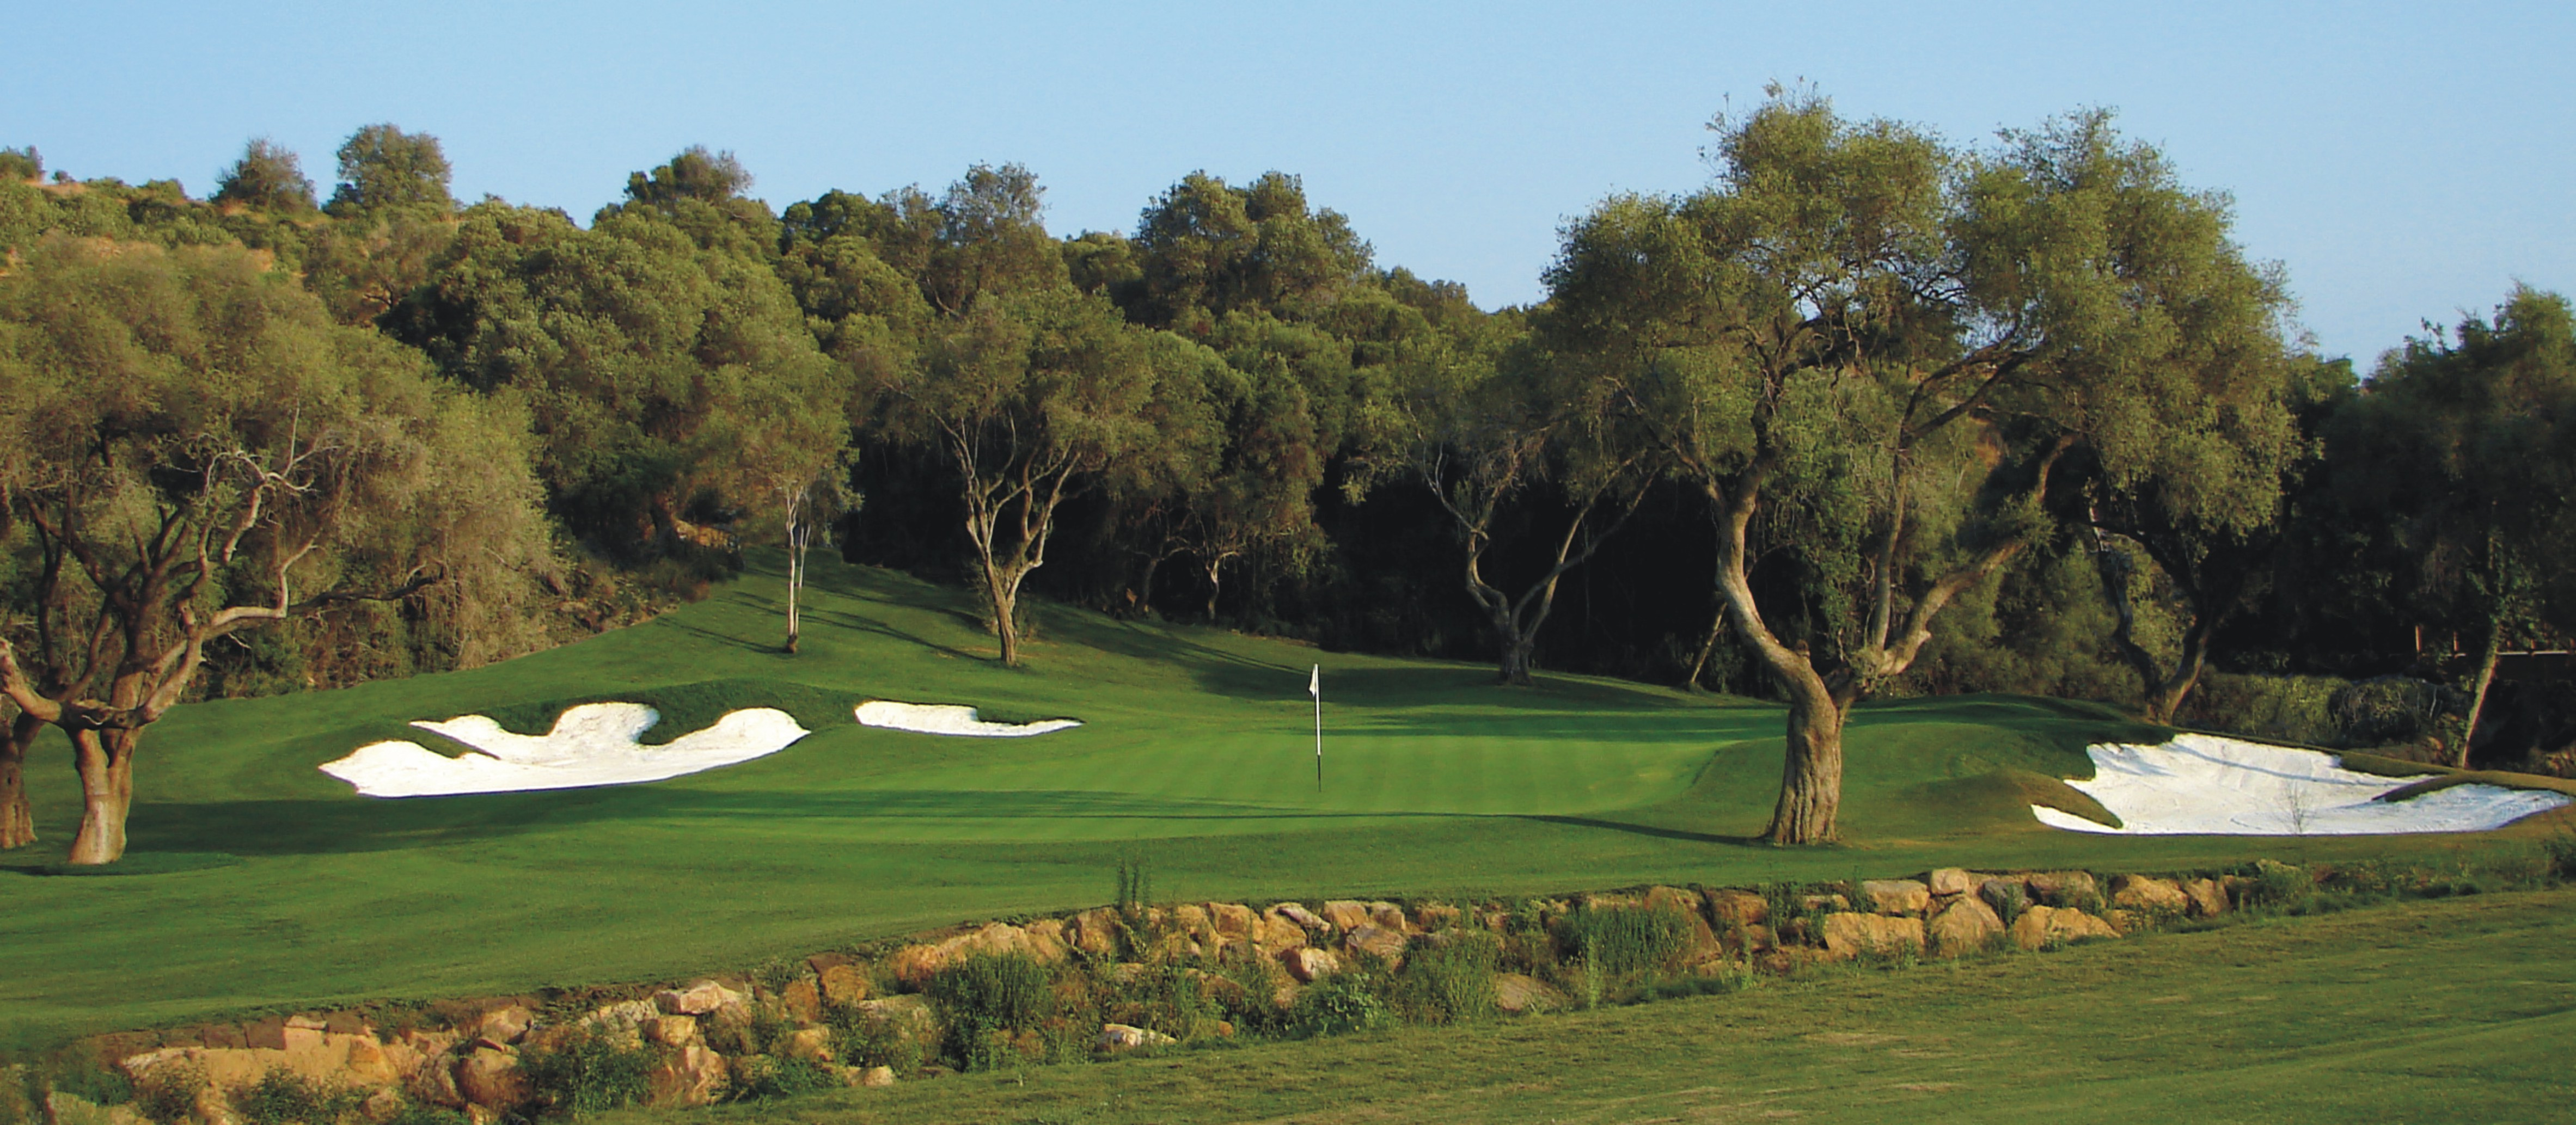 Discount Green Fees On Costa Del Sol Golf Courses